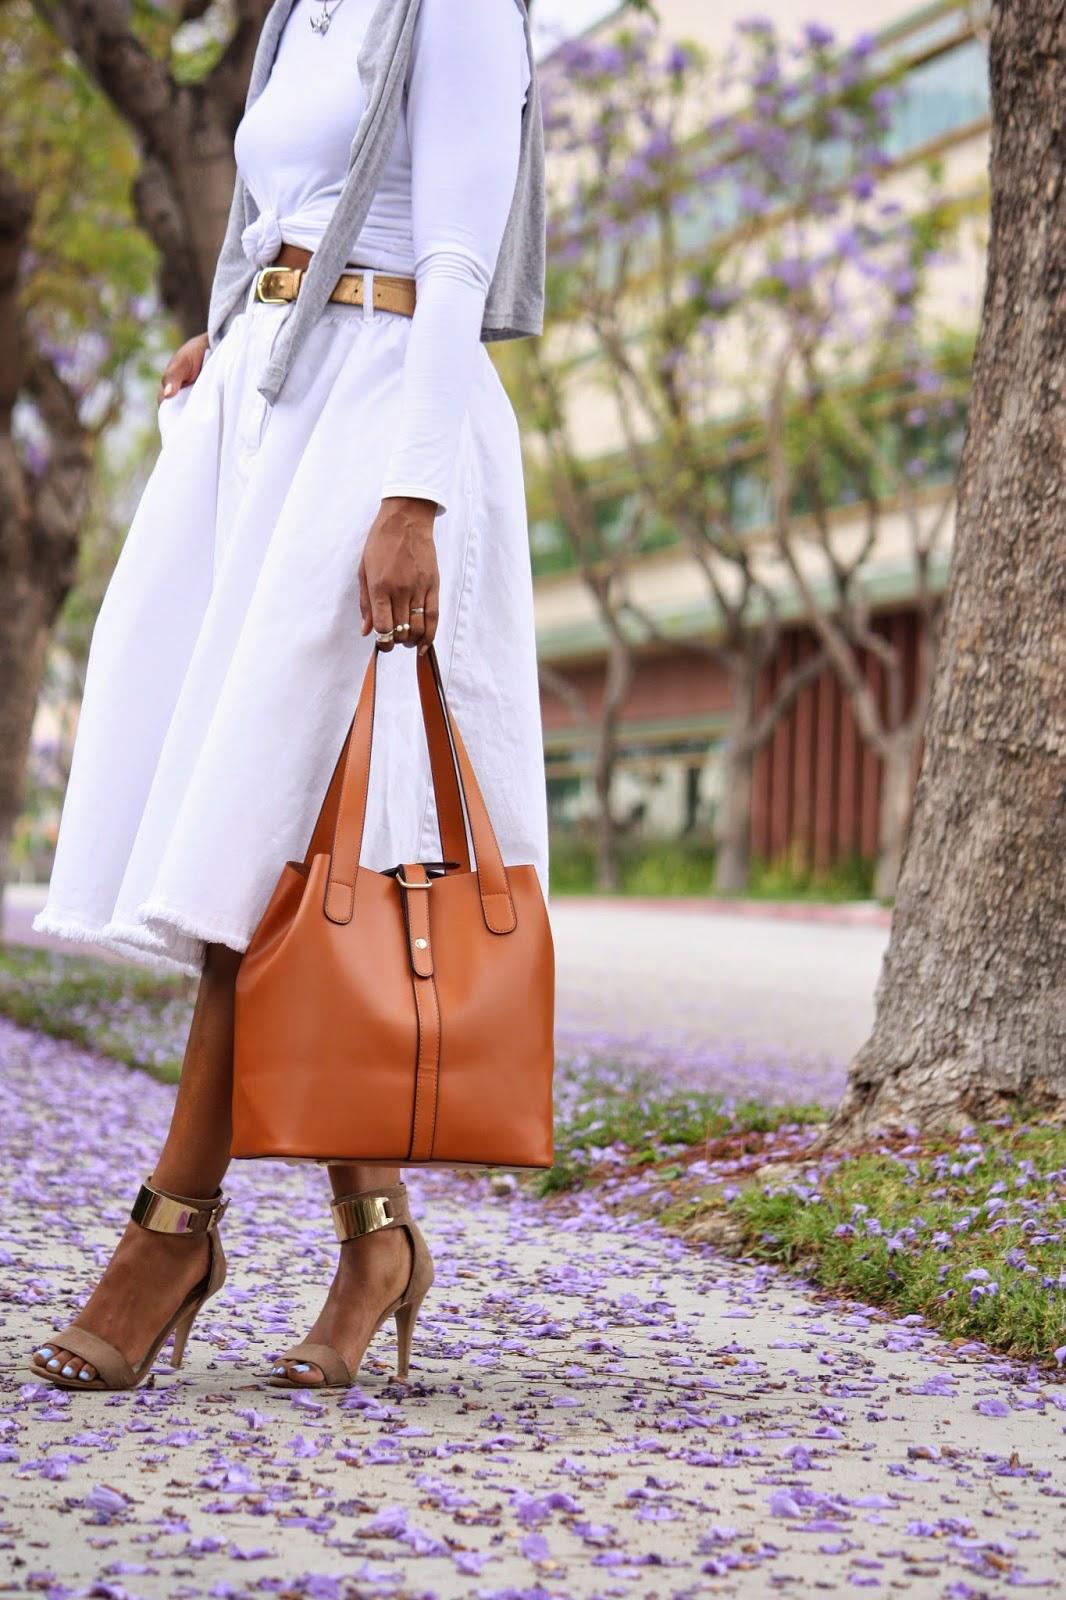 Outfit details, Ms. Littles Bag leather multifunctional bucket bag, HM white denim skirt, Aldo heeled sandals